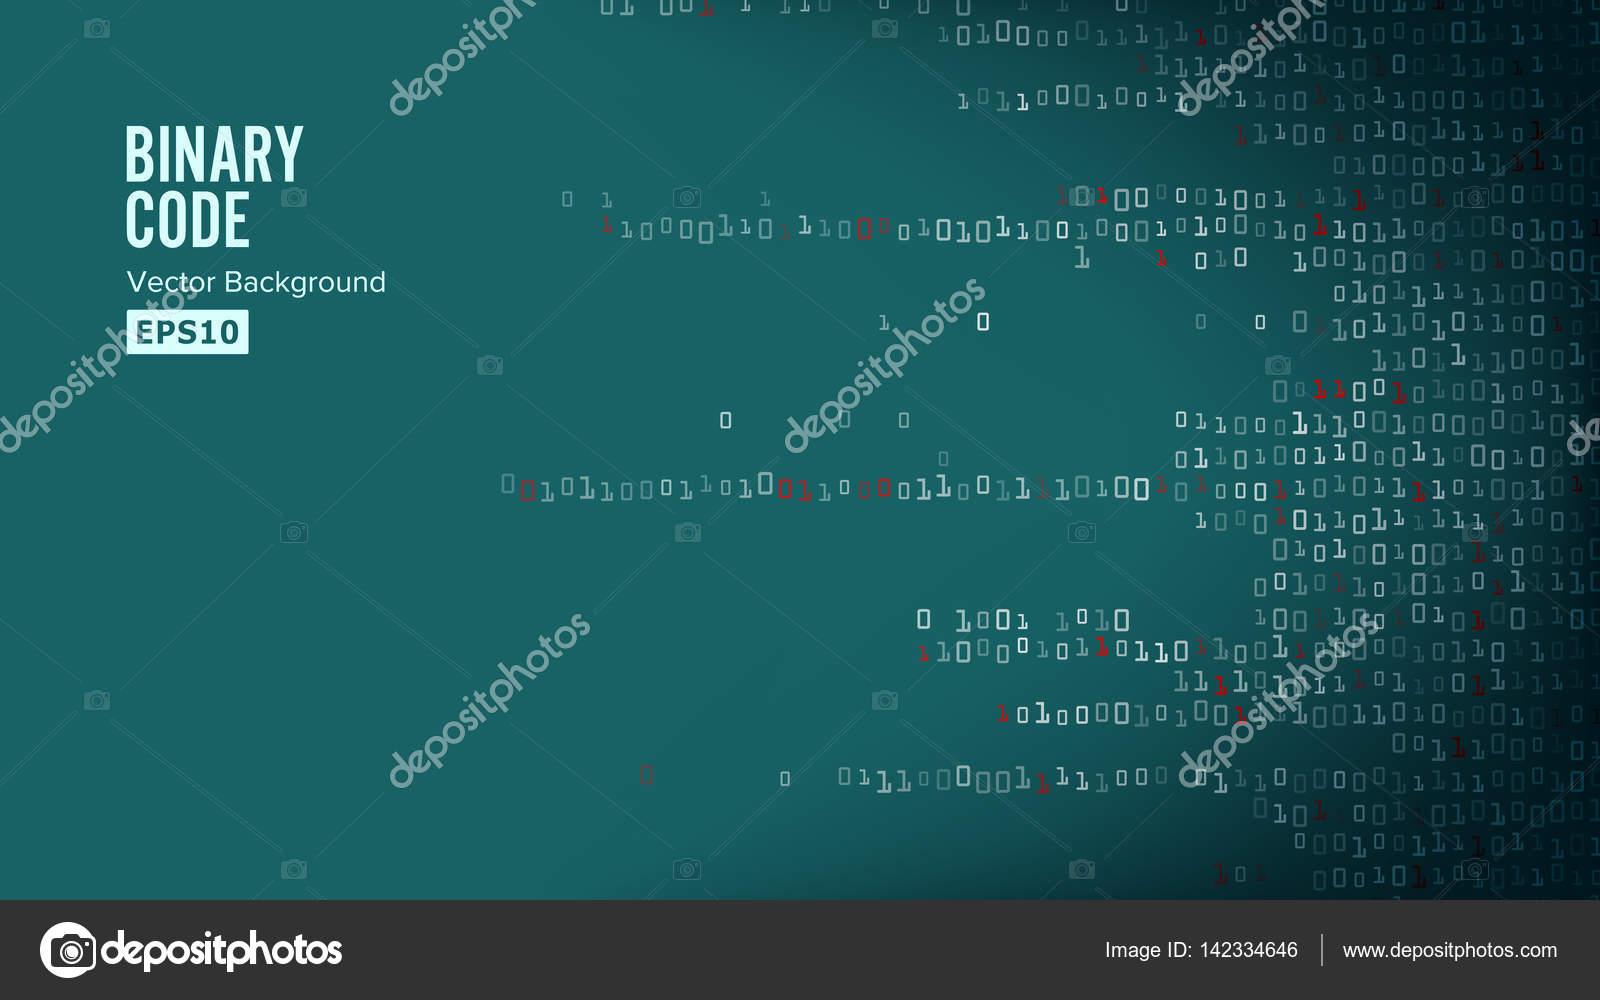 Binary Code Background Vector  Algorithm Binary, Data Code